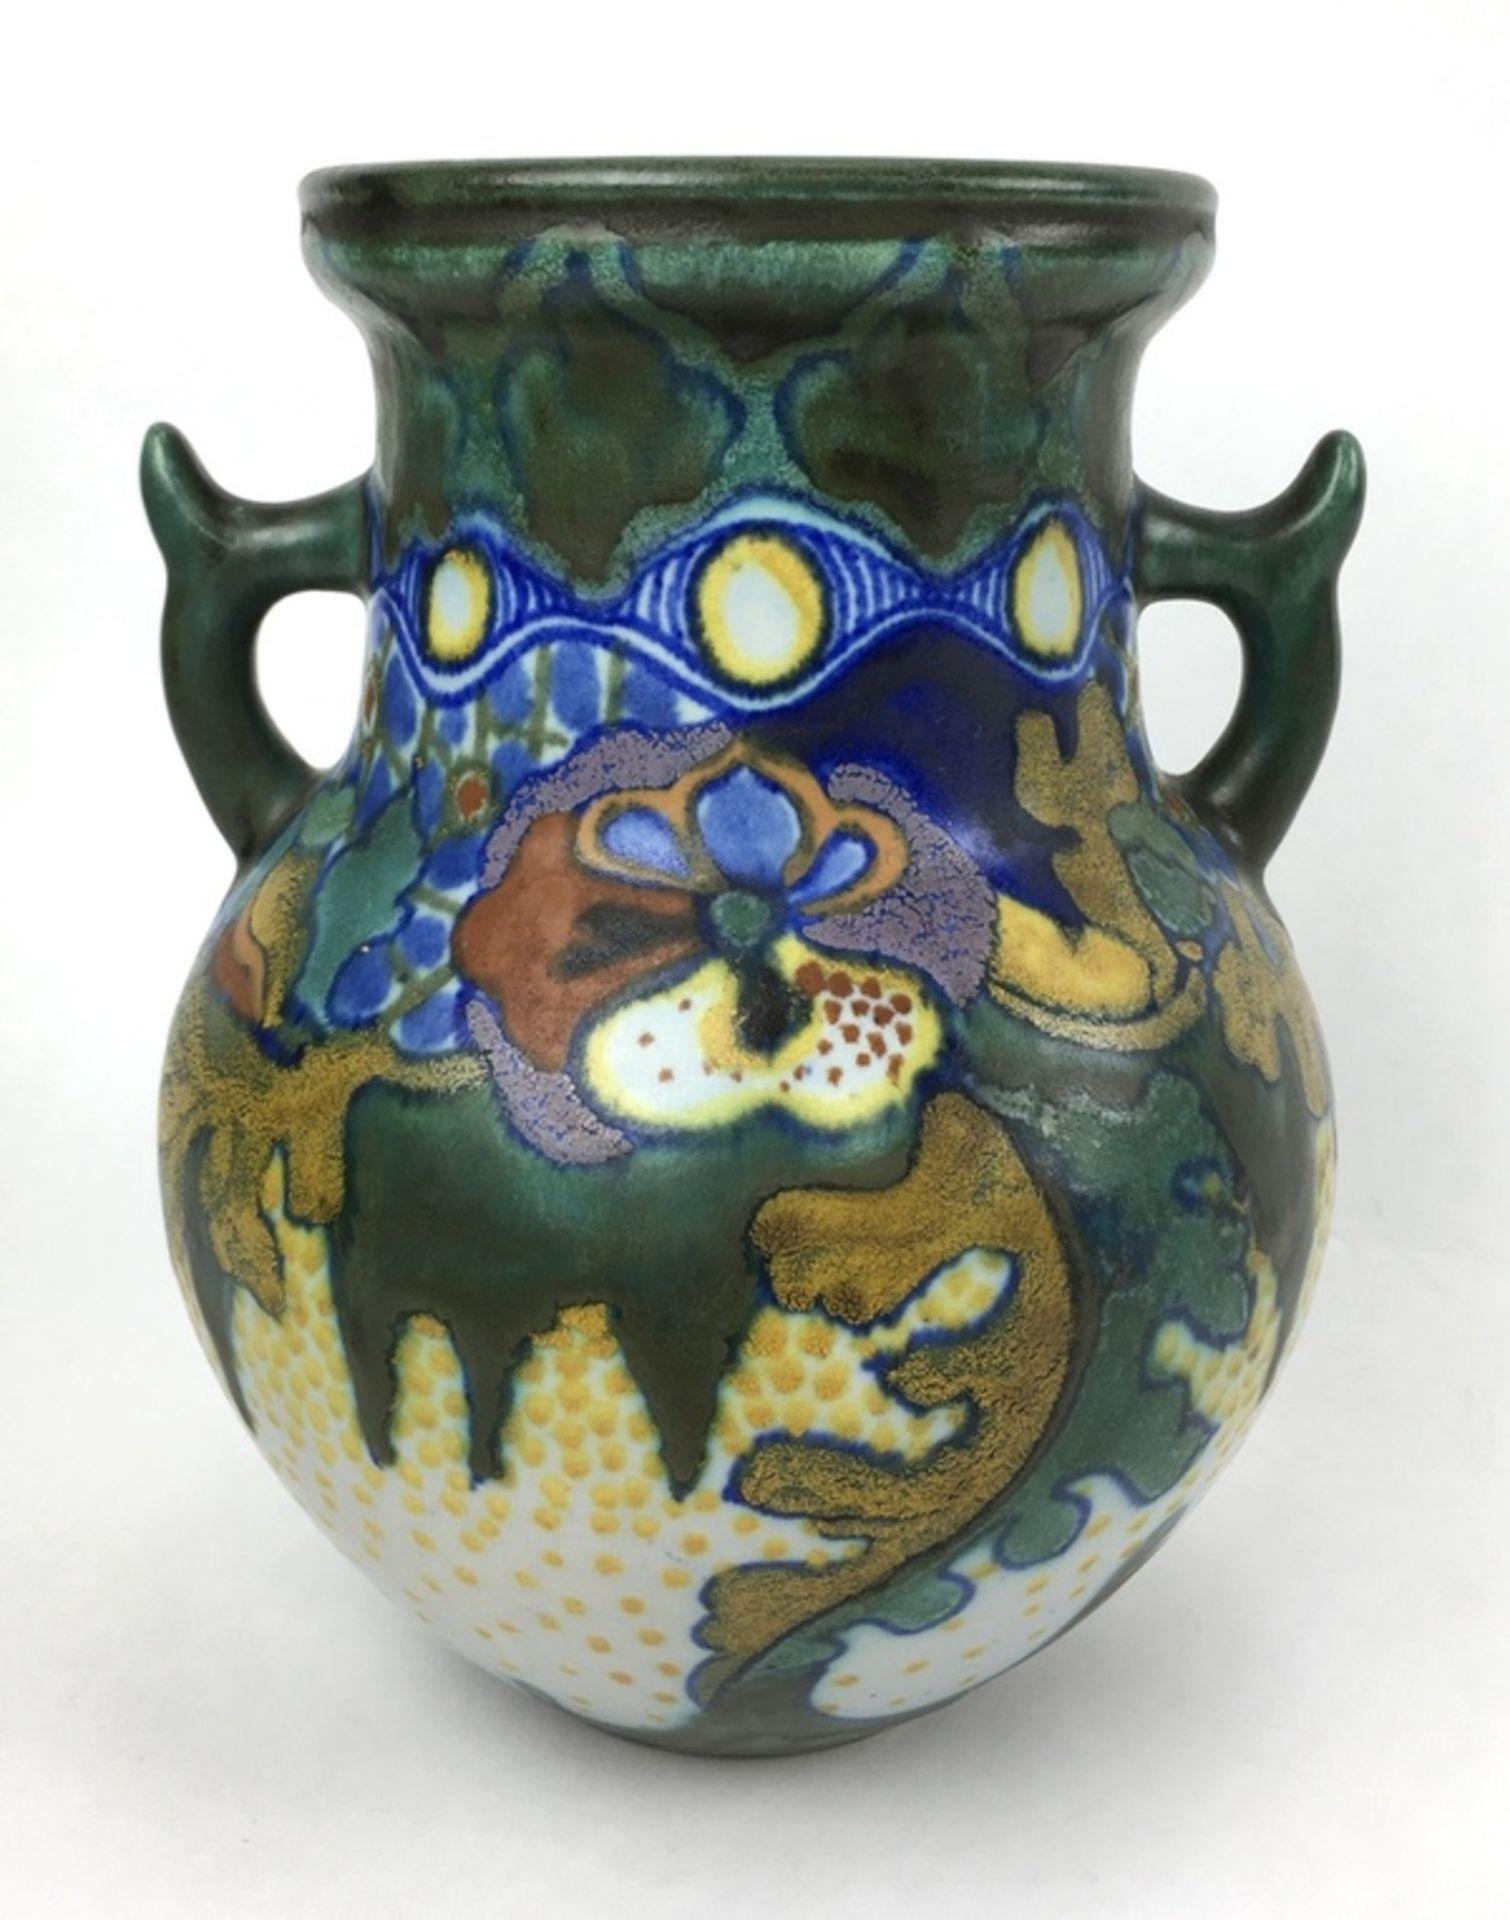 (Toegpaste kunst) Amfora vaas, plateelbakkerij Zuid-HollandAardewerk amfora vaas met decor Coro